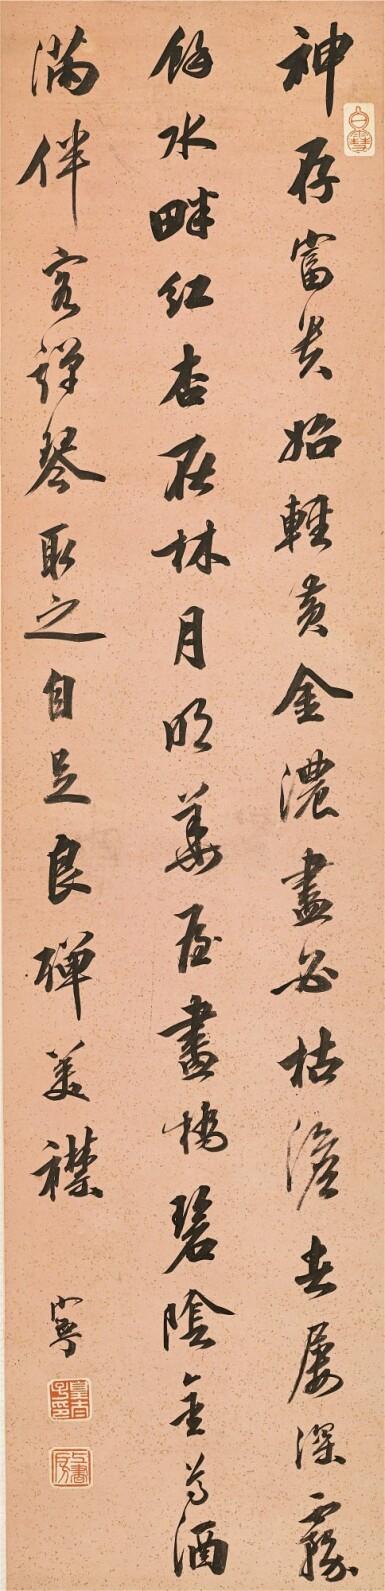 View 1. Thumbnail of Lot 3113. Emperor Daoguang (1782-1850) 綿寧(道光帝)  1782-1850   Calligraphy in Running Script 行書節錄《二十四詩品‧綺麗》.